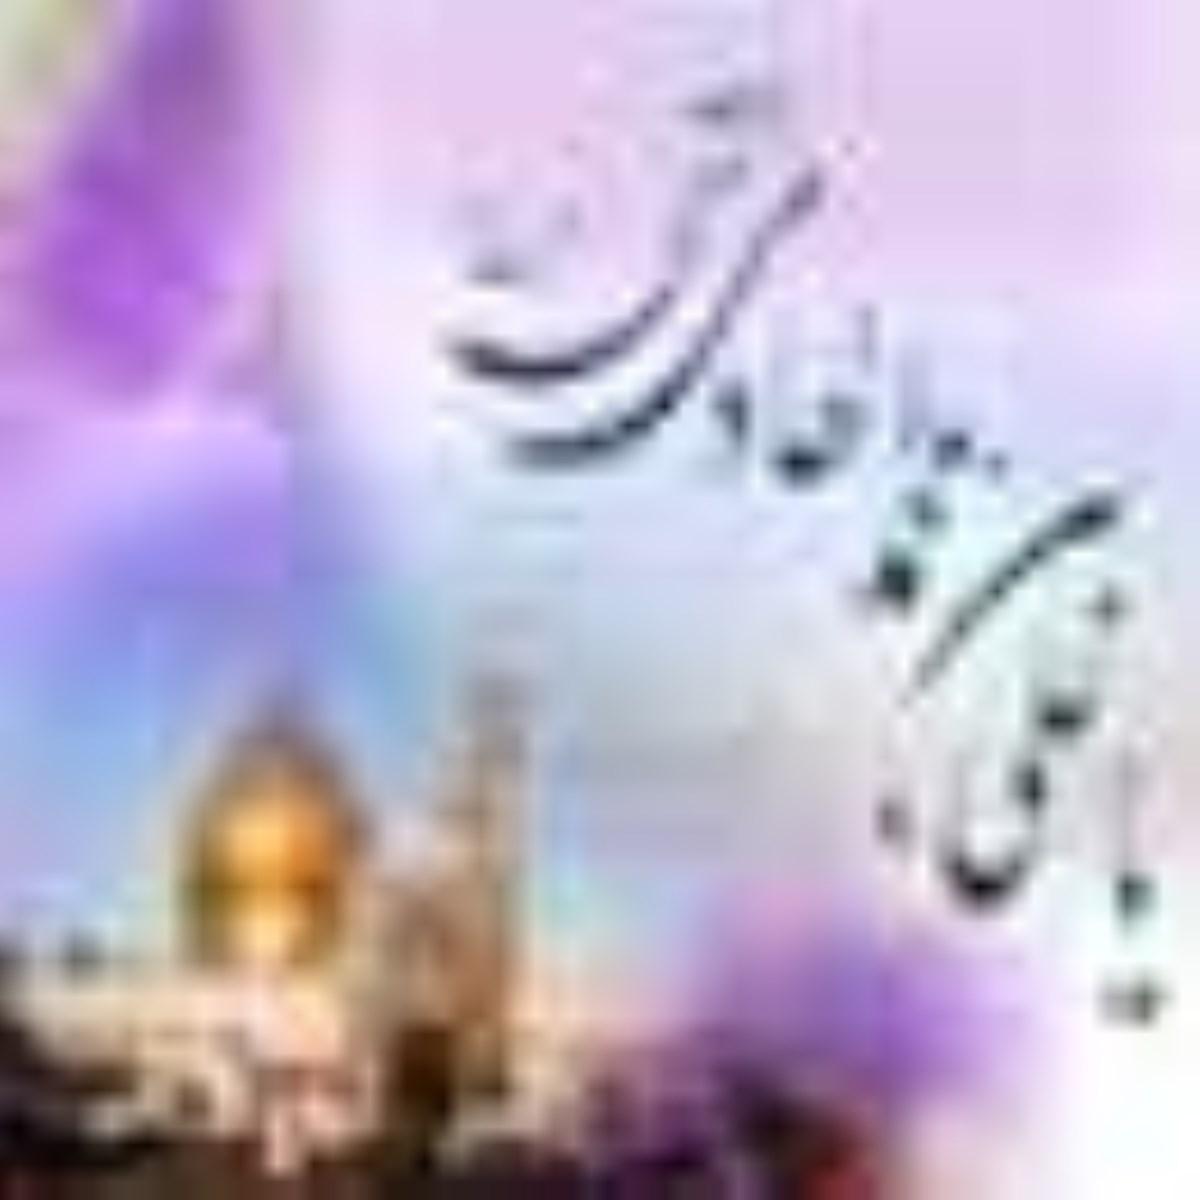 بَدْر ذی الحجّه( میلاد امام هادی علیهالسلام)